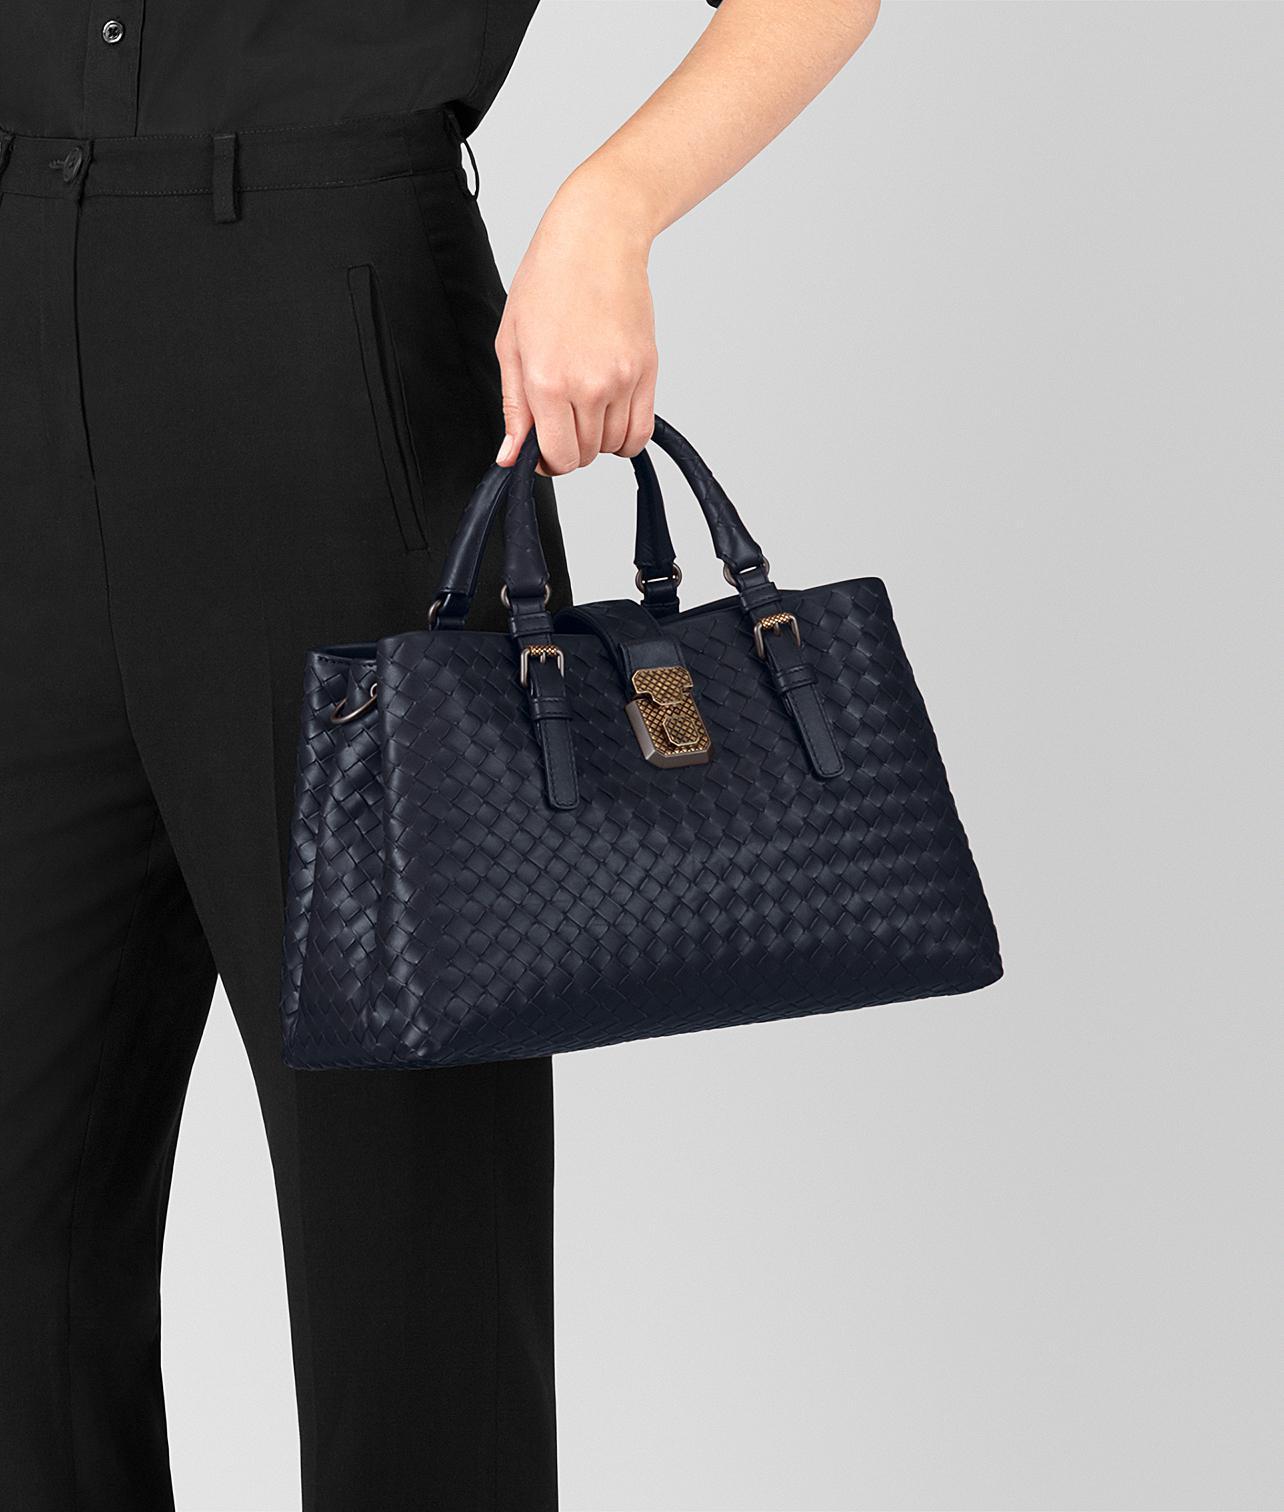 Bottega Veneta Dark Cement Intrecciato Calf Roma Bag in Blue - Lyst 77a72314b311b